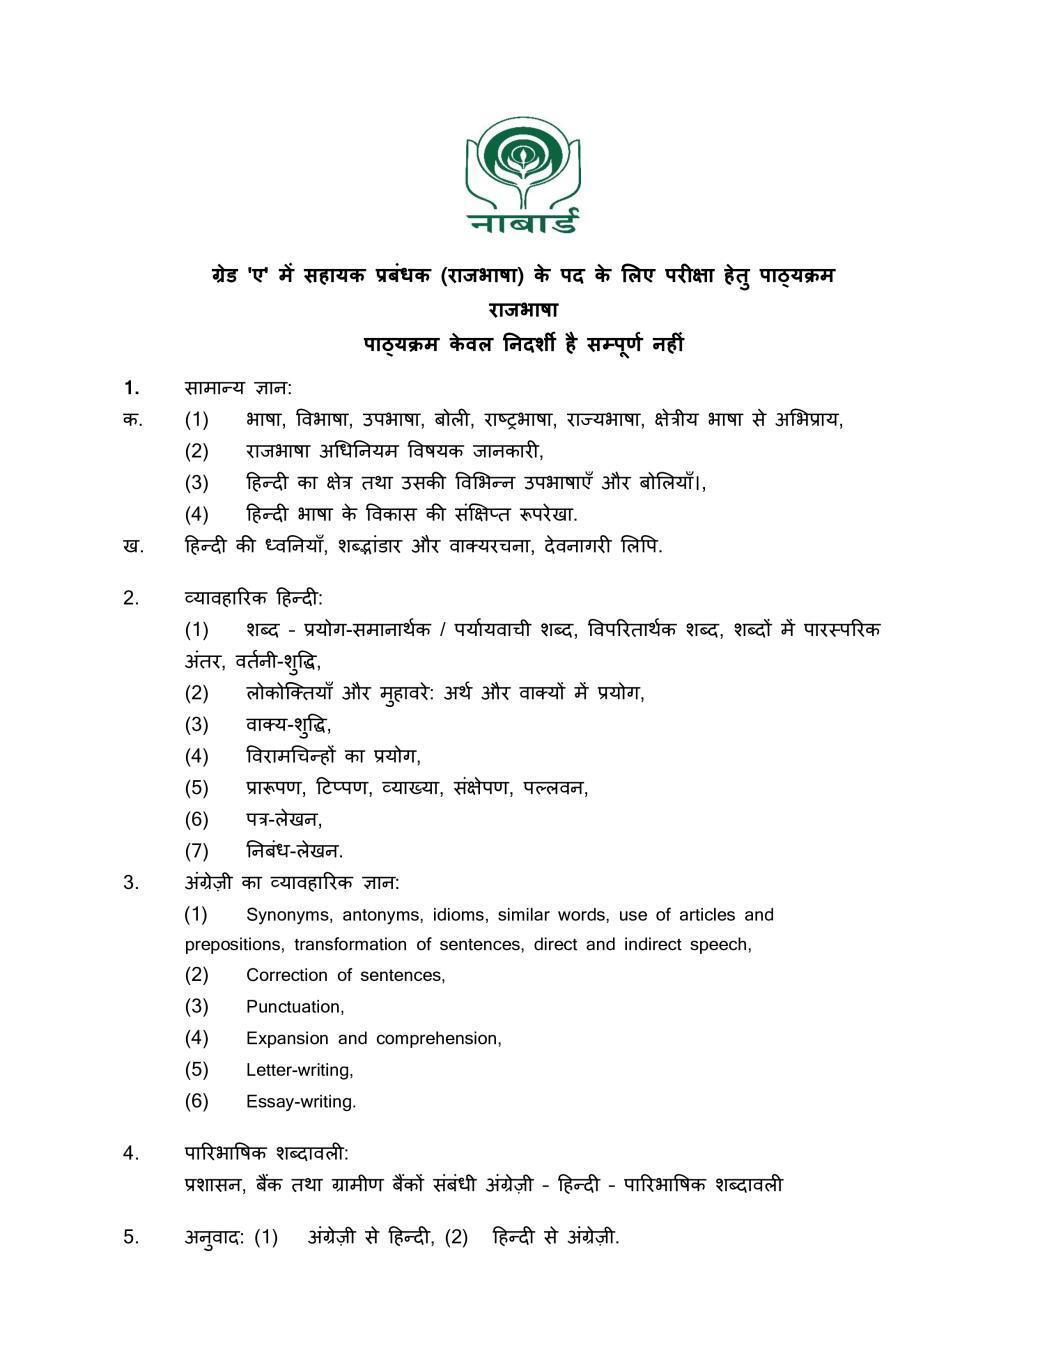 NABARD Grade A Syllabus 2020 Rajbhasha - Page 1